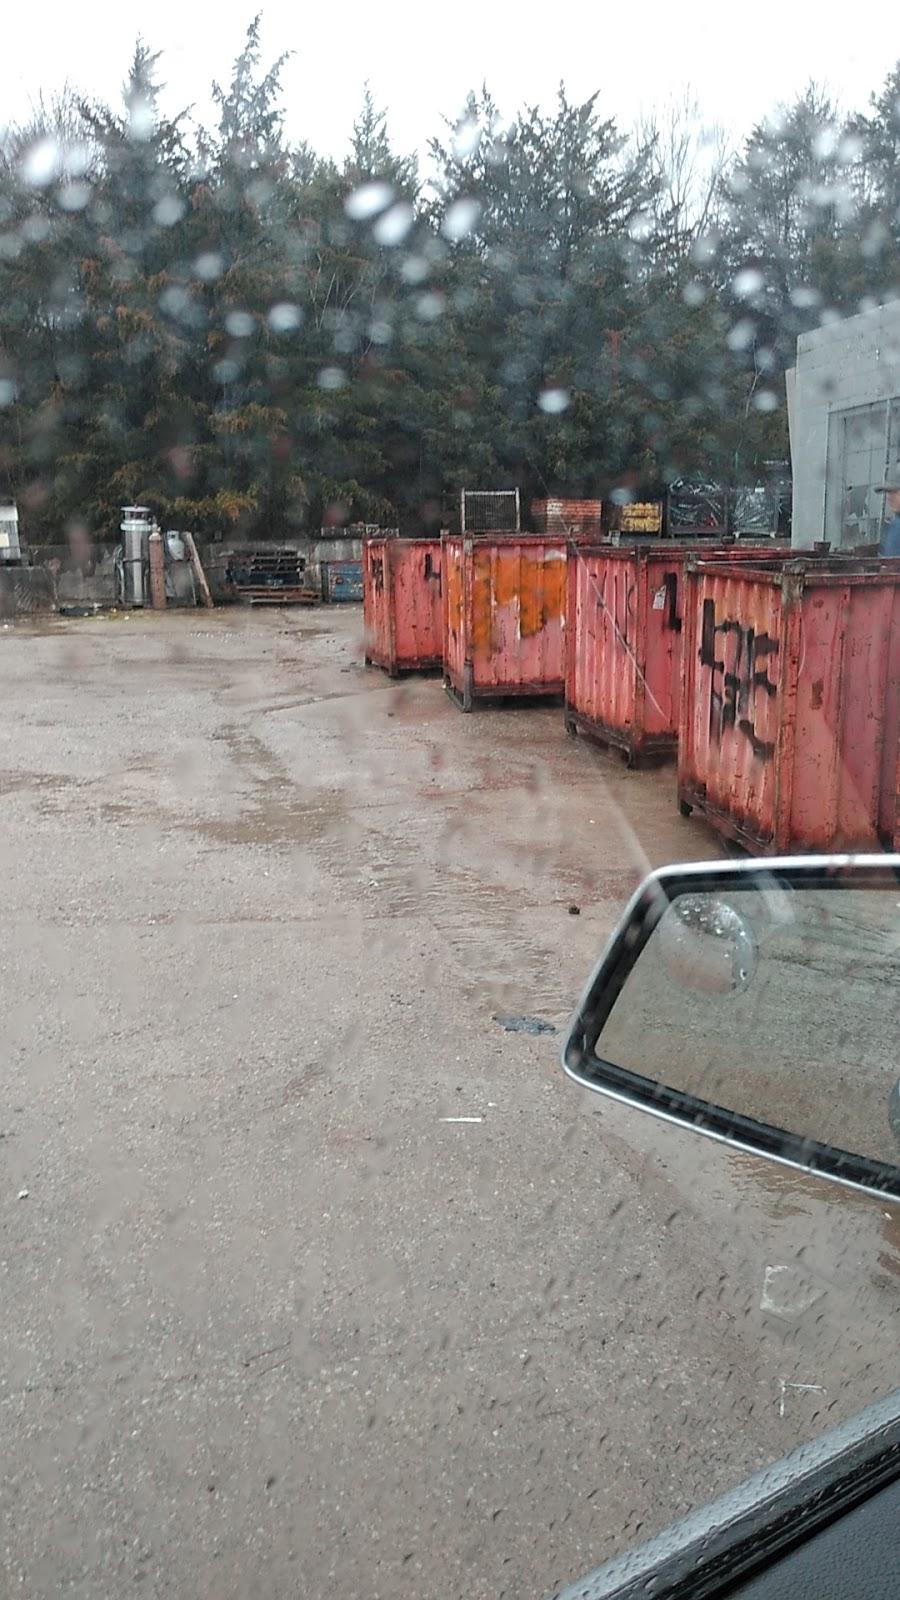 B Miller Recycling - car repair  | Photo 1 of 2 | Address: 1979 Carters Creek Pike, Franklin, TN 37064, USA | Phone: (615) 794-1704